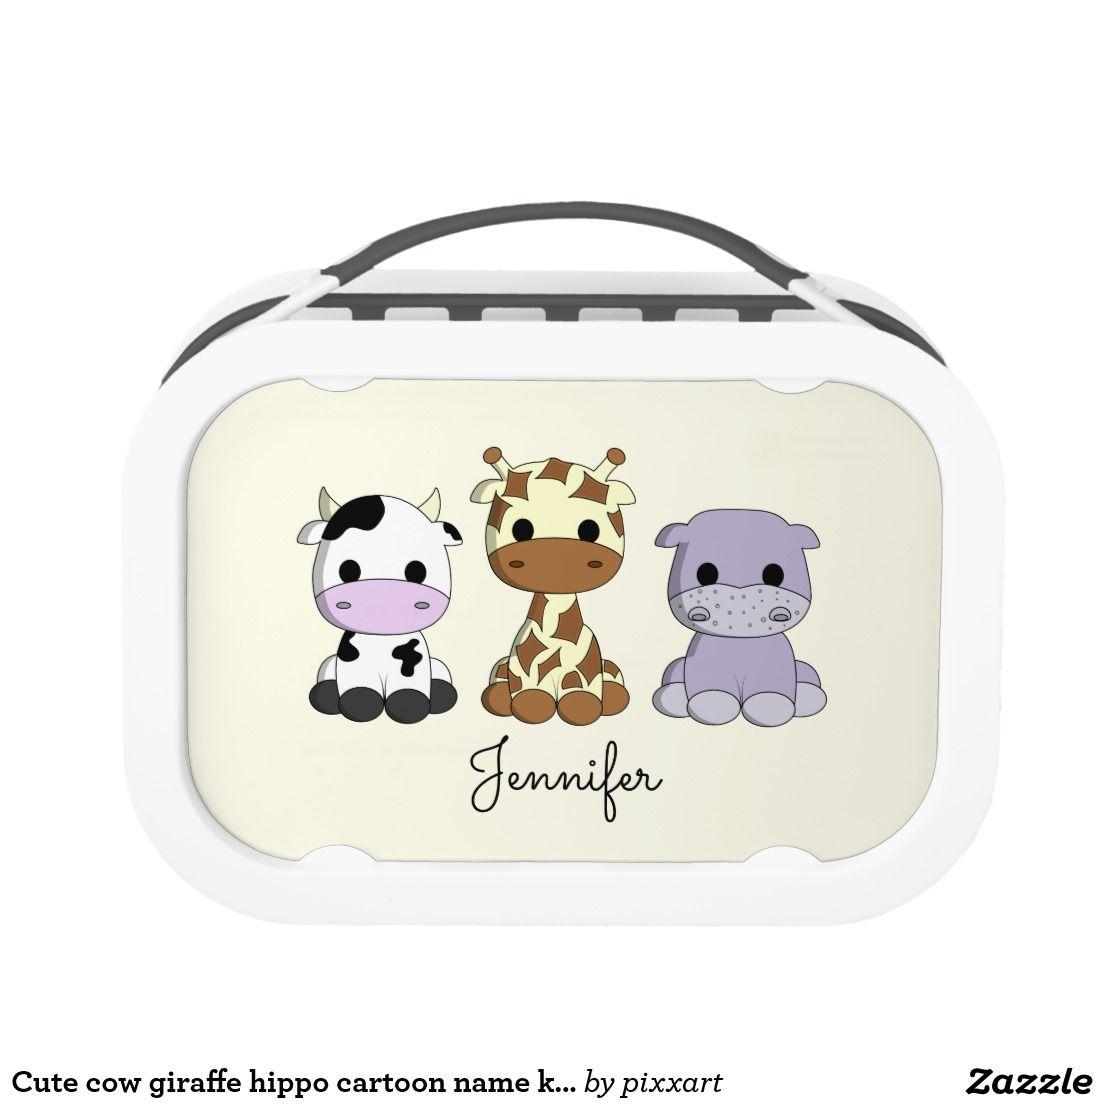 Cute Cow Giraffe Hippo Cartoon Name Kids Lunchbox Lunch Box Kids Lunchbox Hippo Cartoon